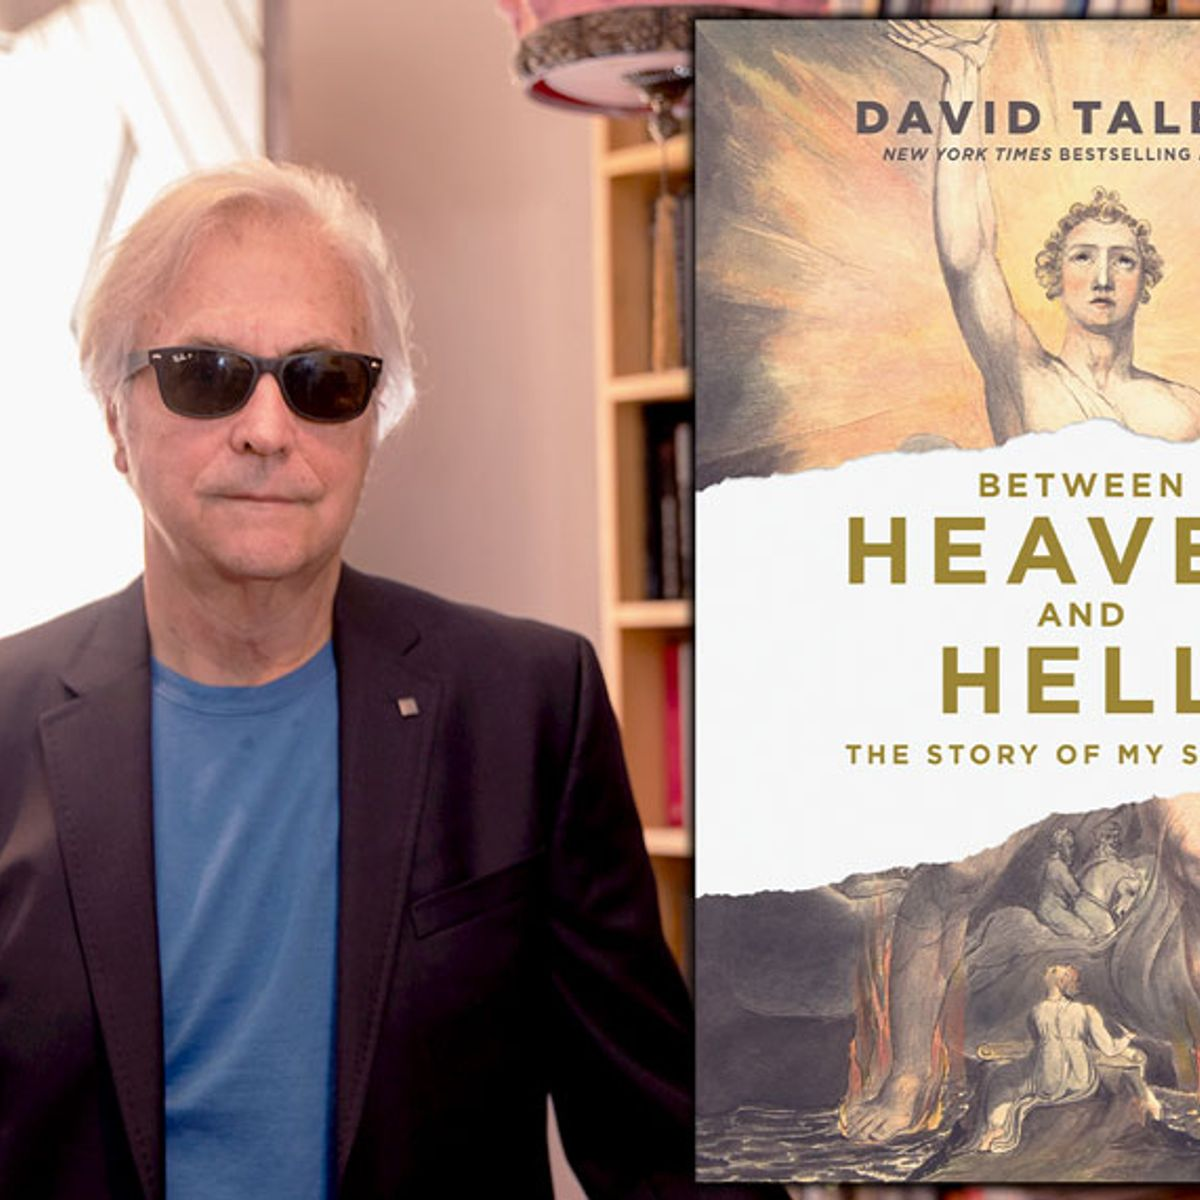 """I felt my boundaries. I had shrunk."" David Talbot on post-stroke existentialism"